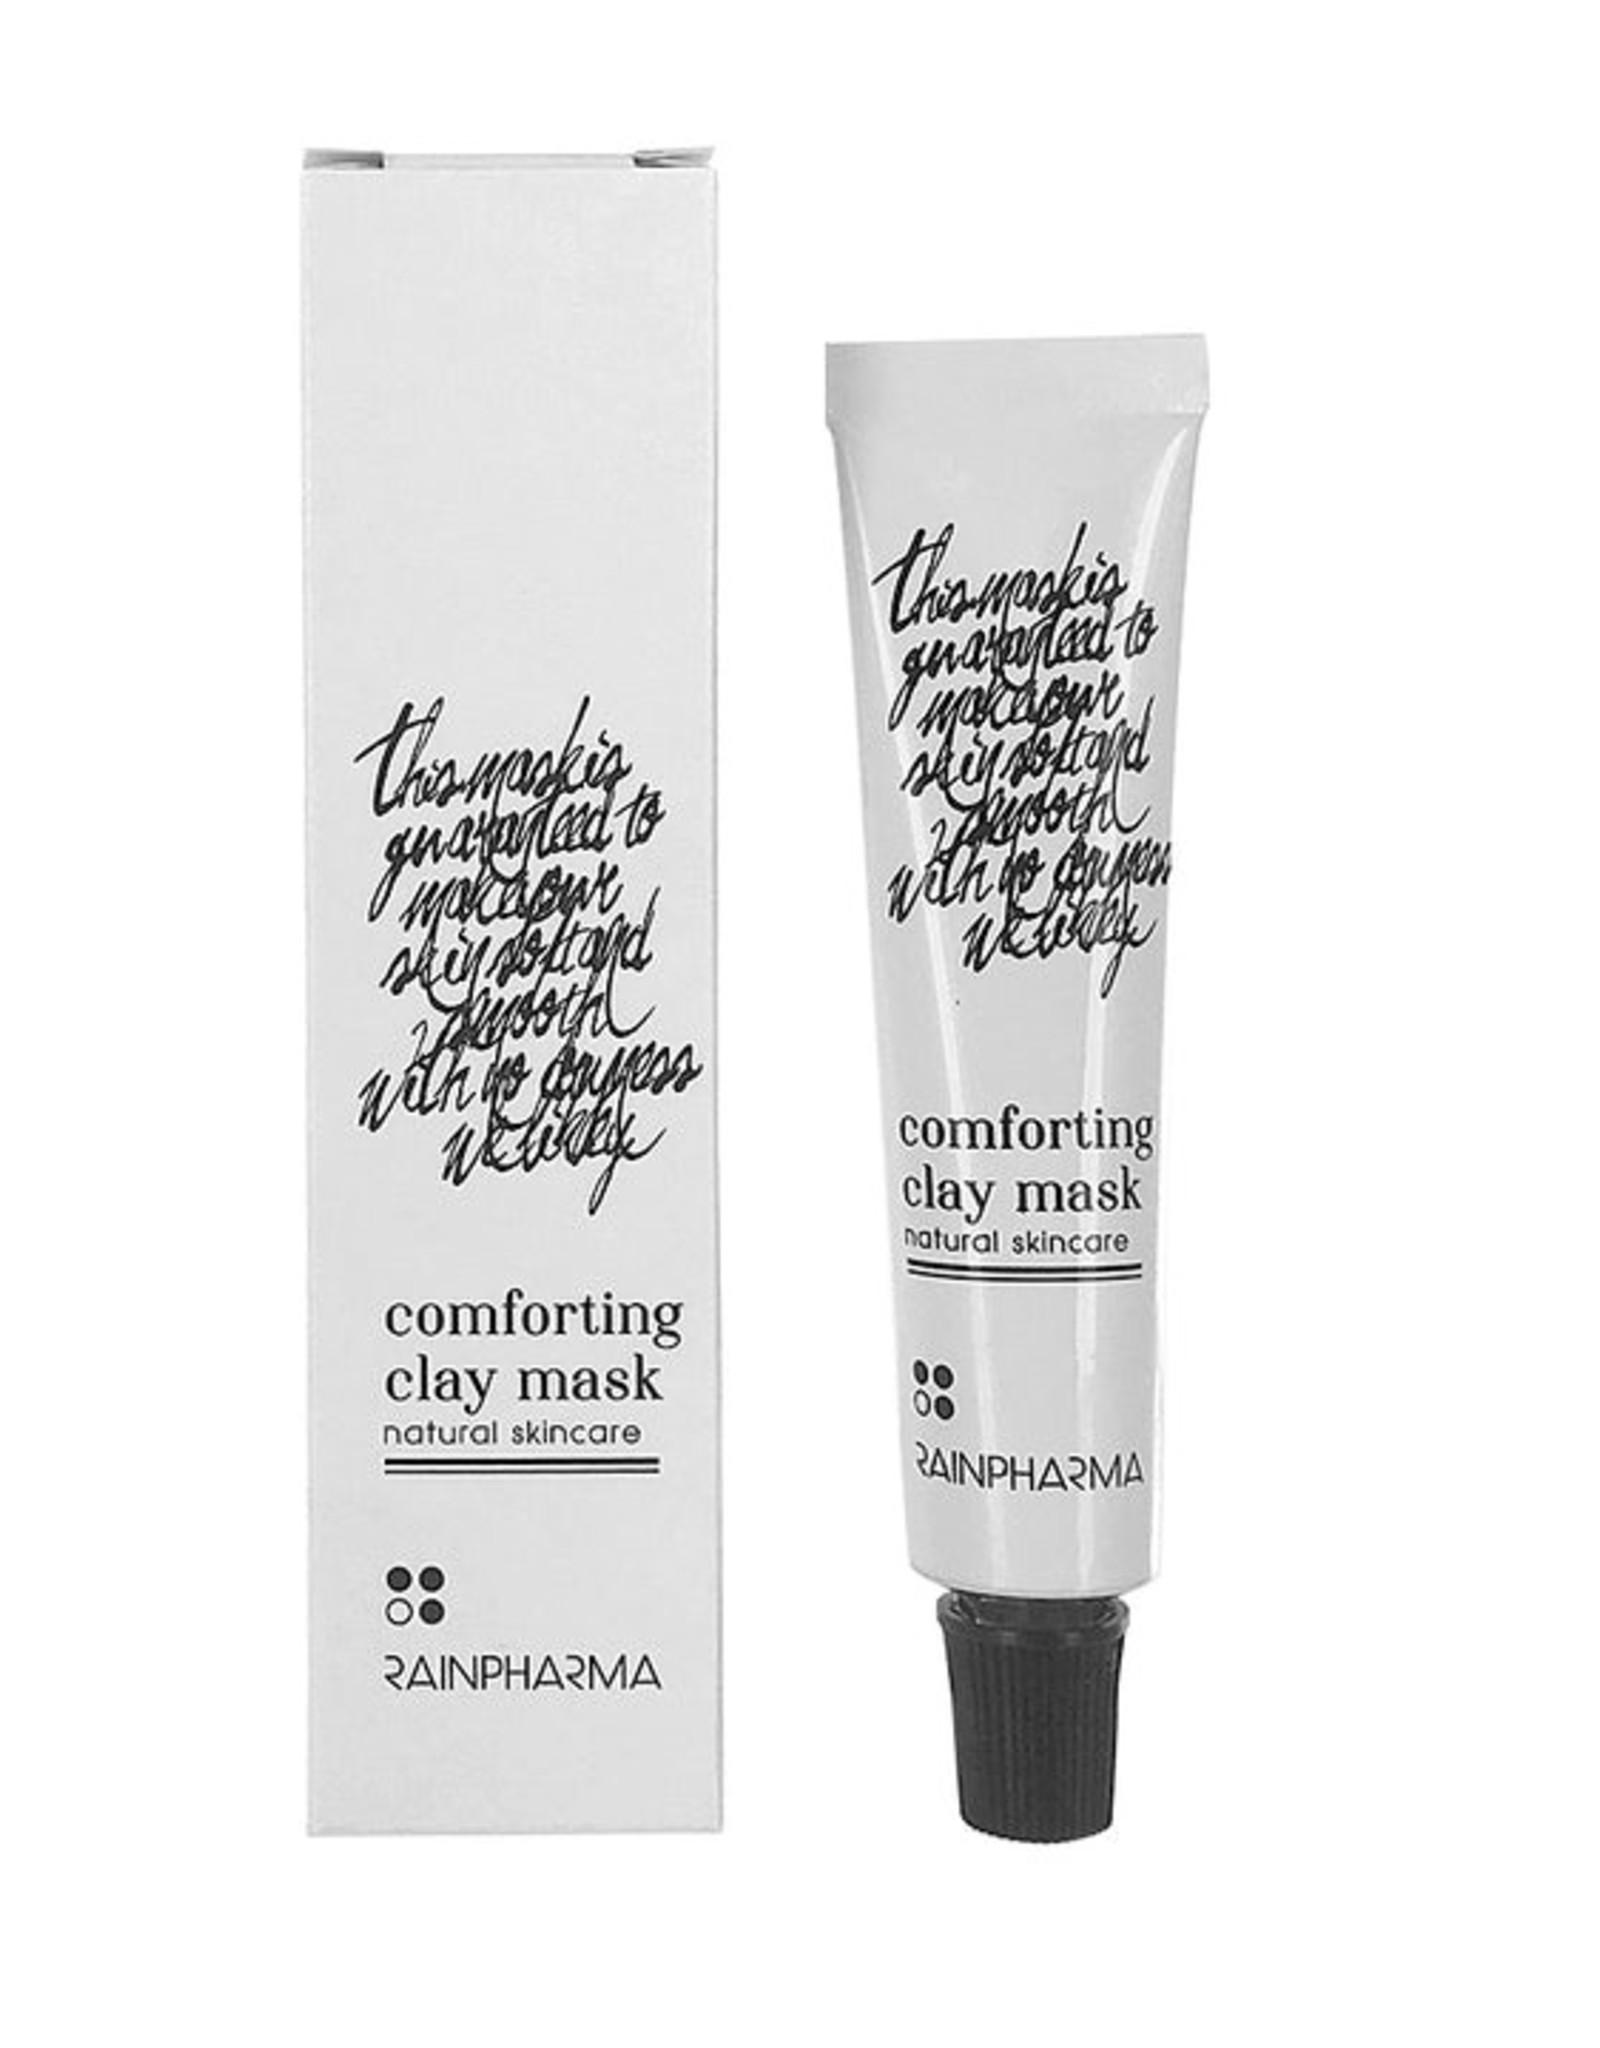 RainPharma Clay Series - Comforting Clay Mask 10ml TRAVELSIZE - Rainpharma